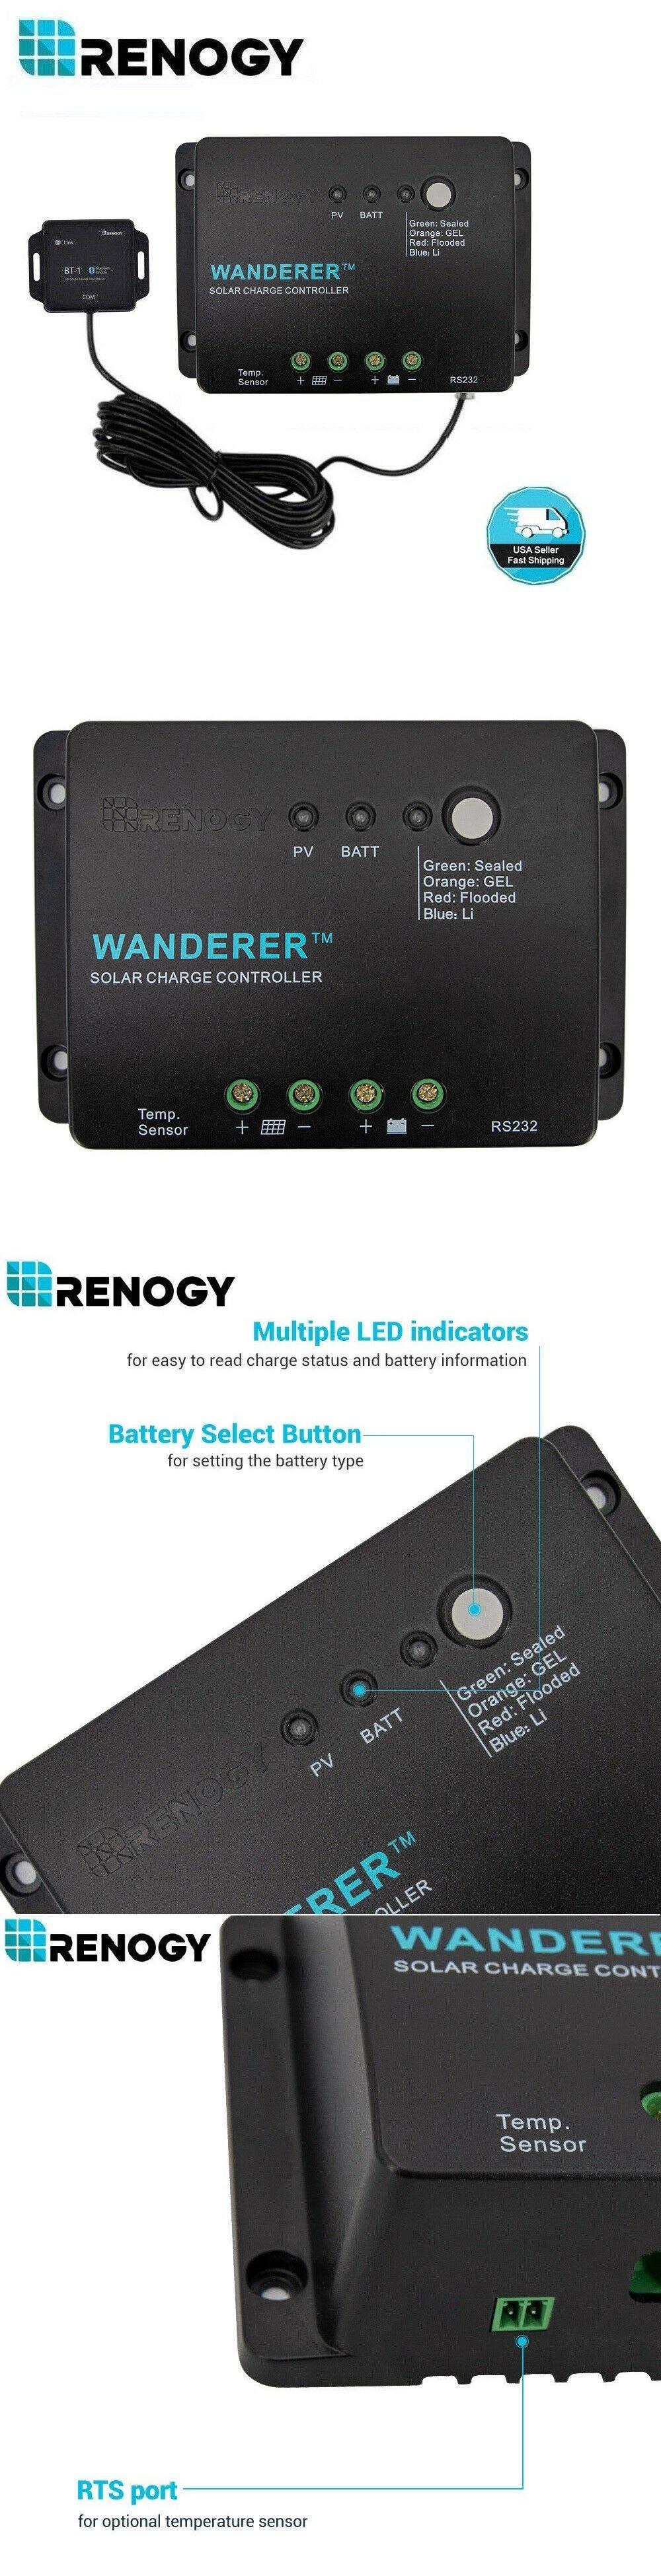 Details About Renogy Wanderer Li 30a Pwm Charge Controller 12v Negative Ground Solar Regulator Solar Panel Battery Solar Ebay